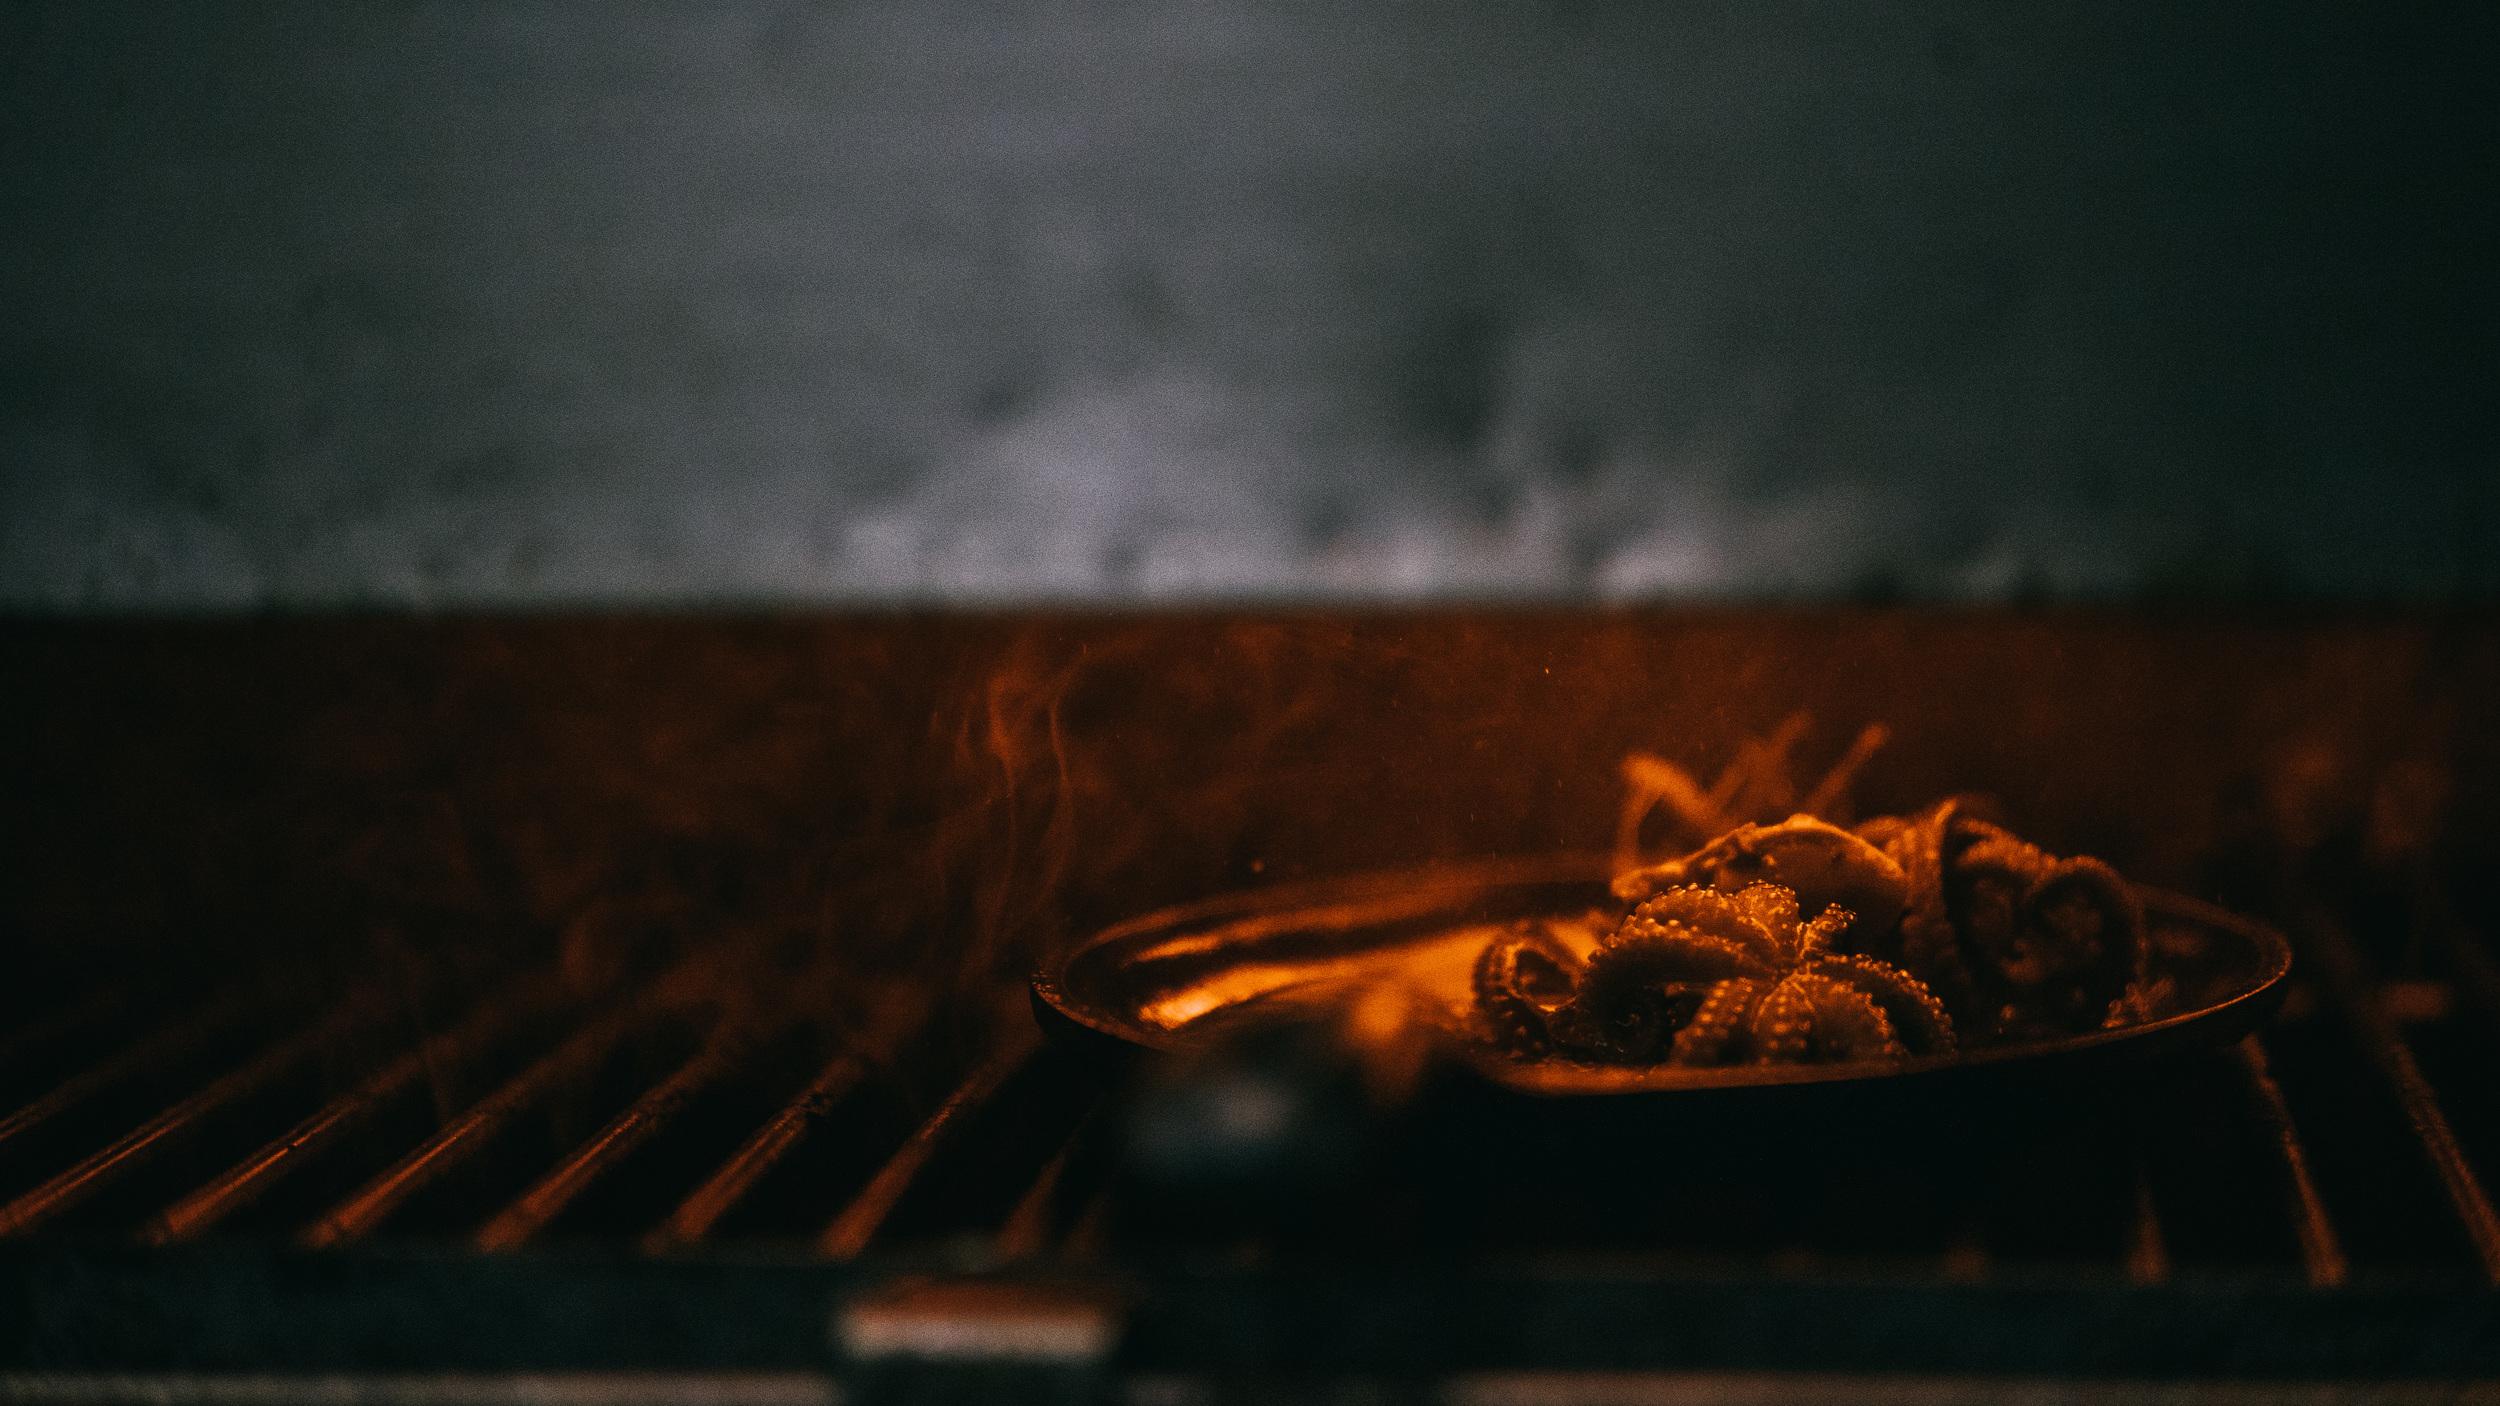 JAR_October_Tumblr-5.jpg